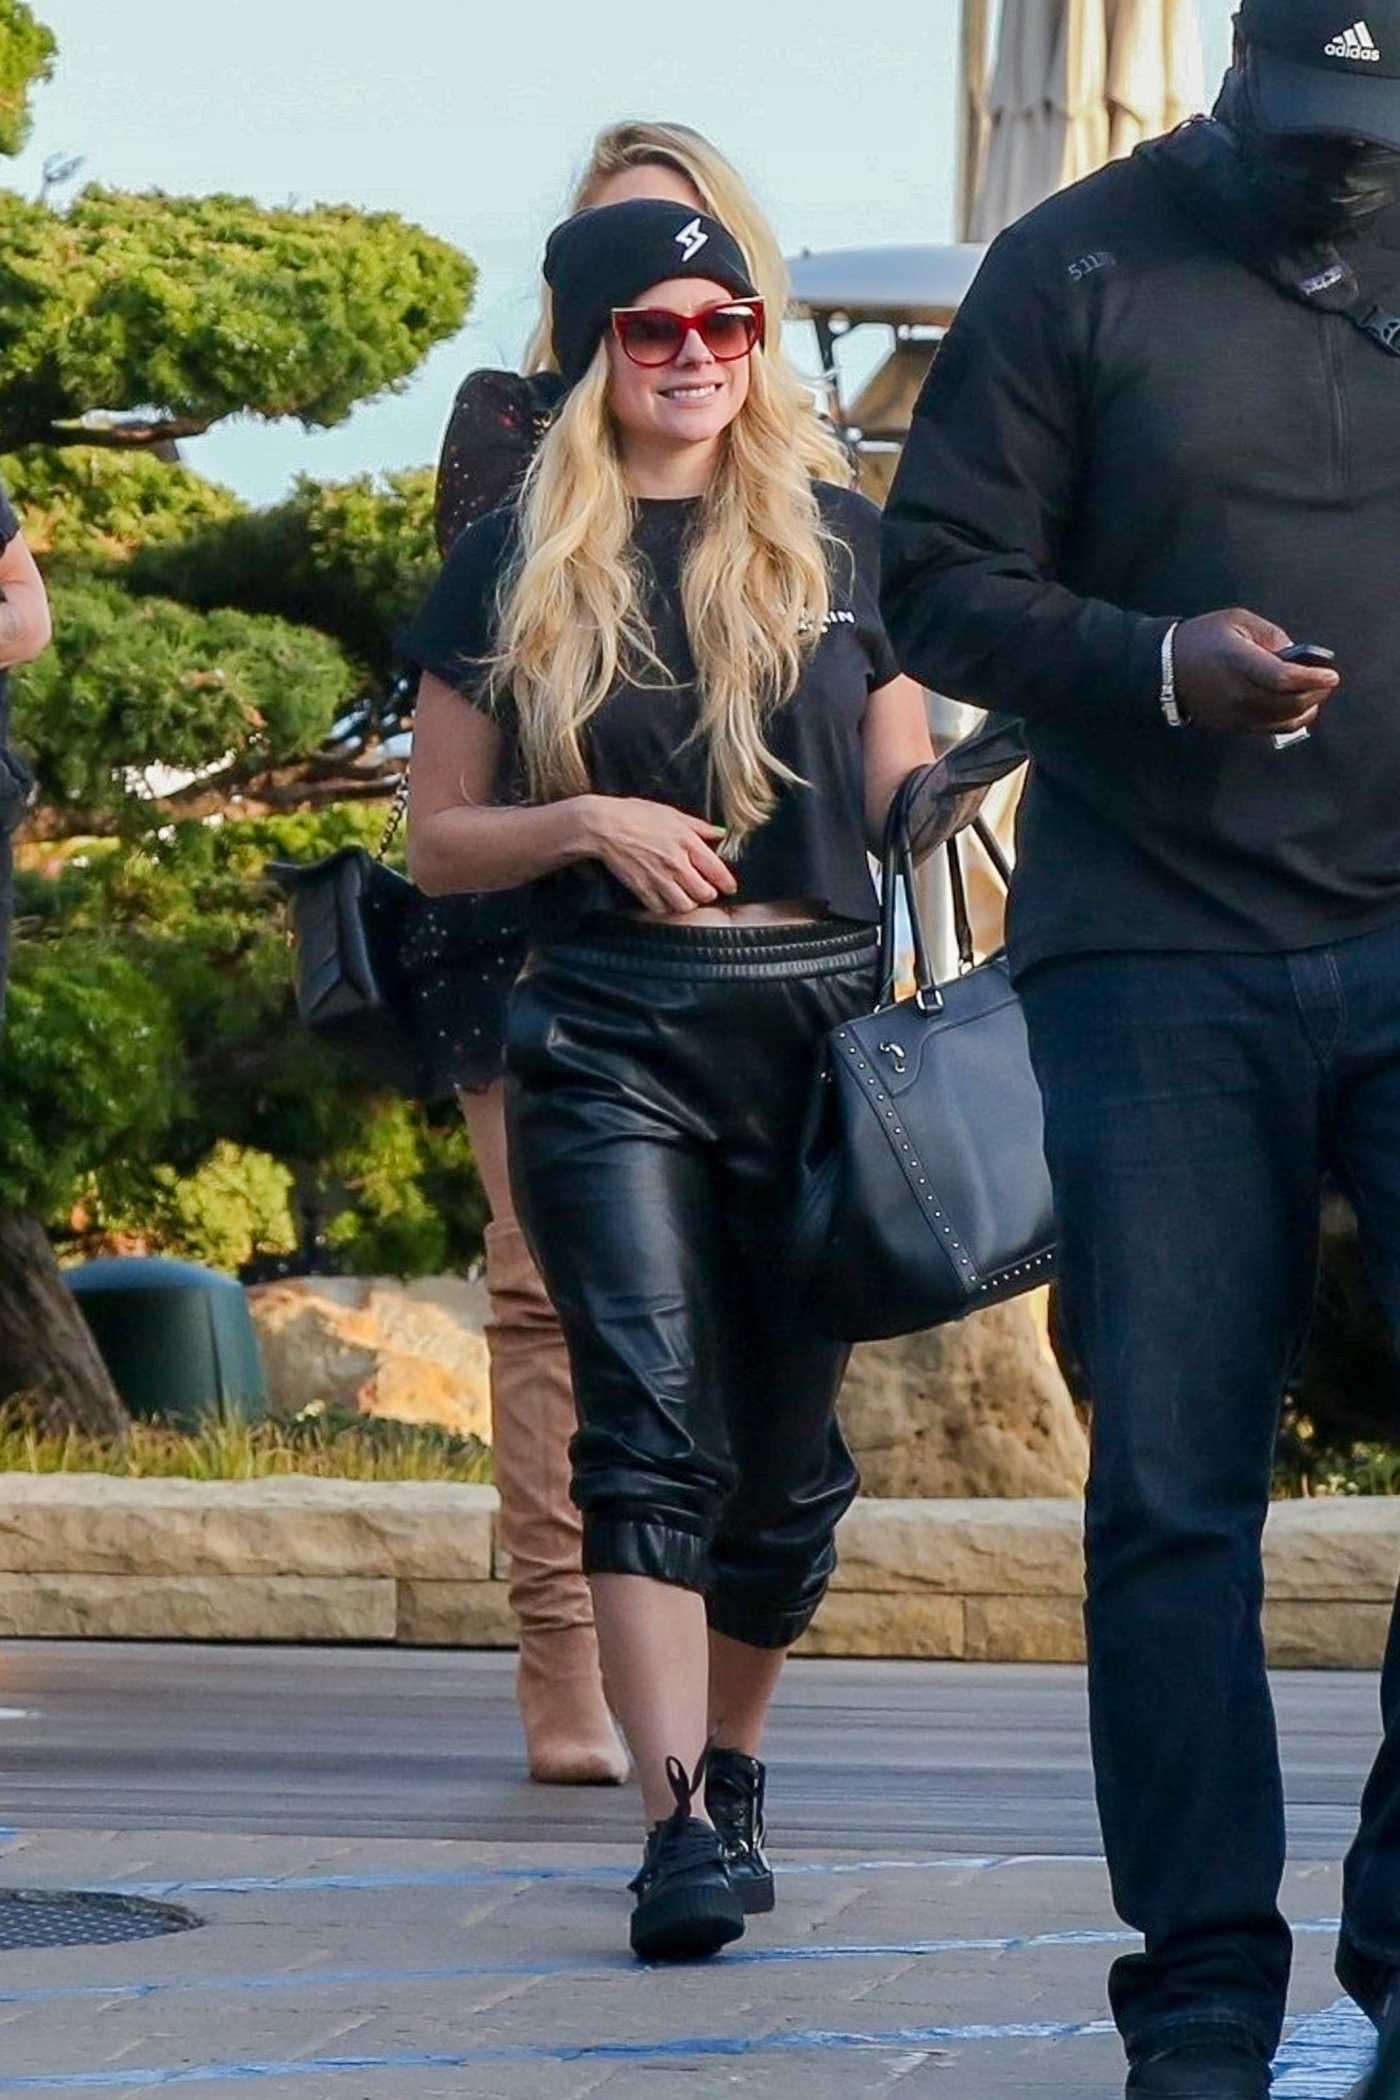 Avril Lavigne in a Black Outfit Arrives at Nobu Restaurant in Malibu 05/22/2021